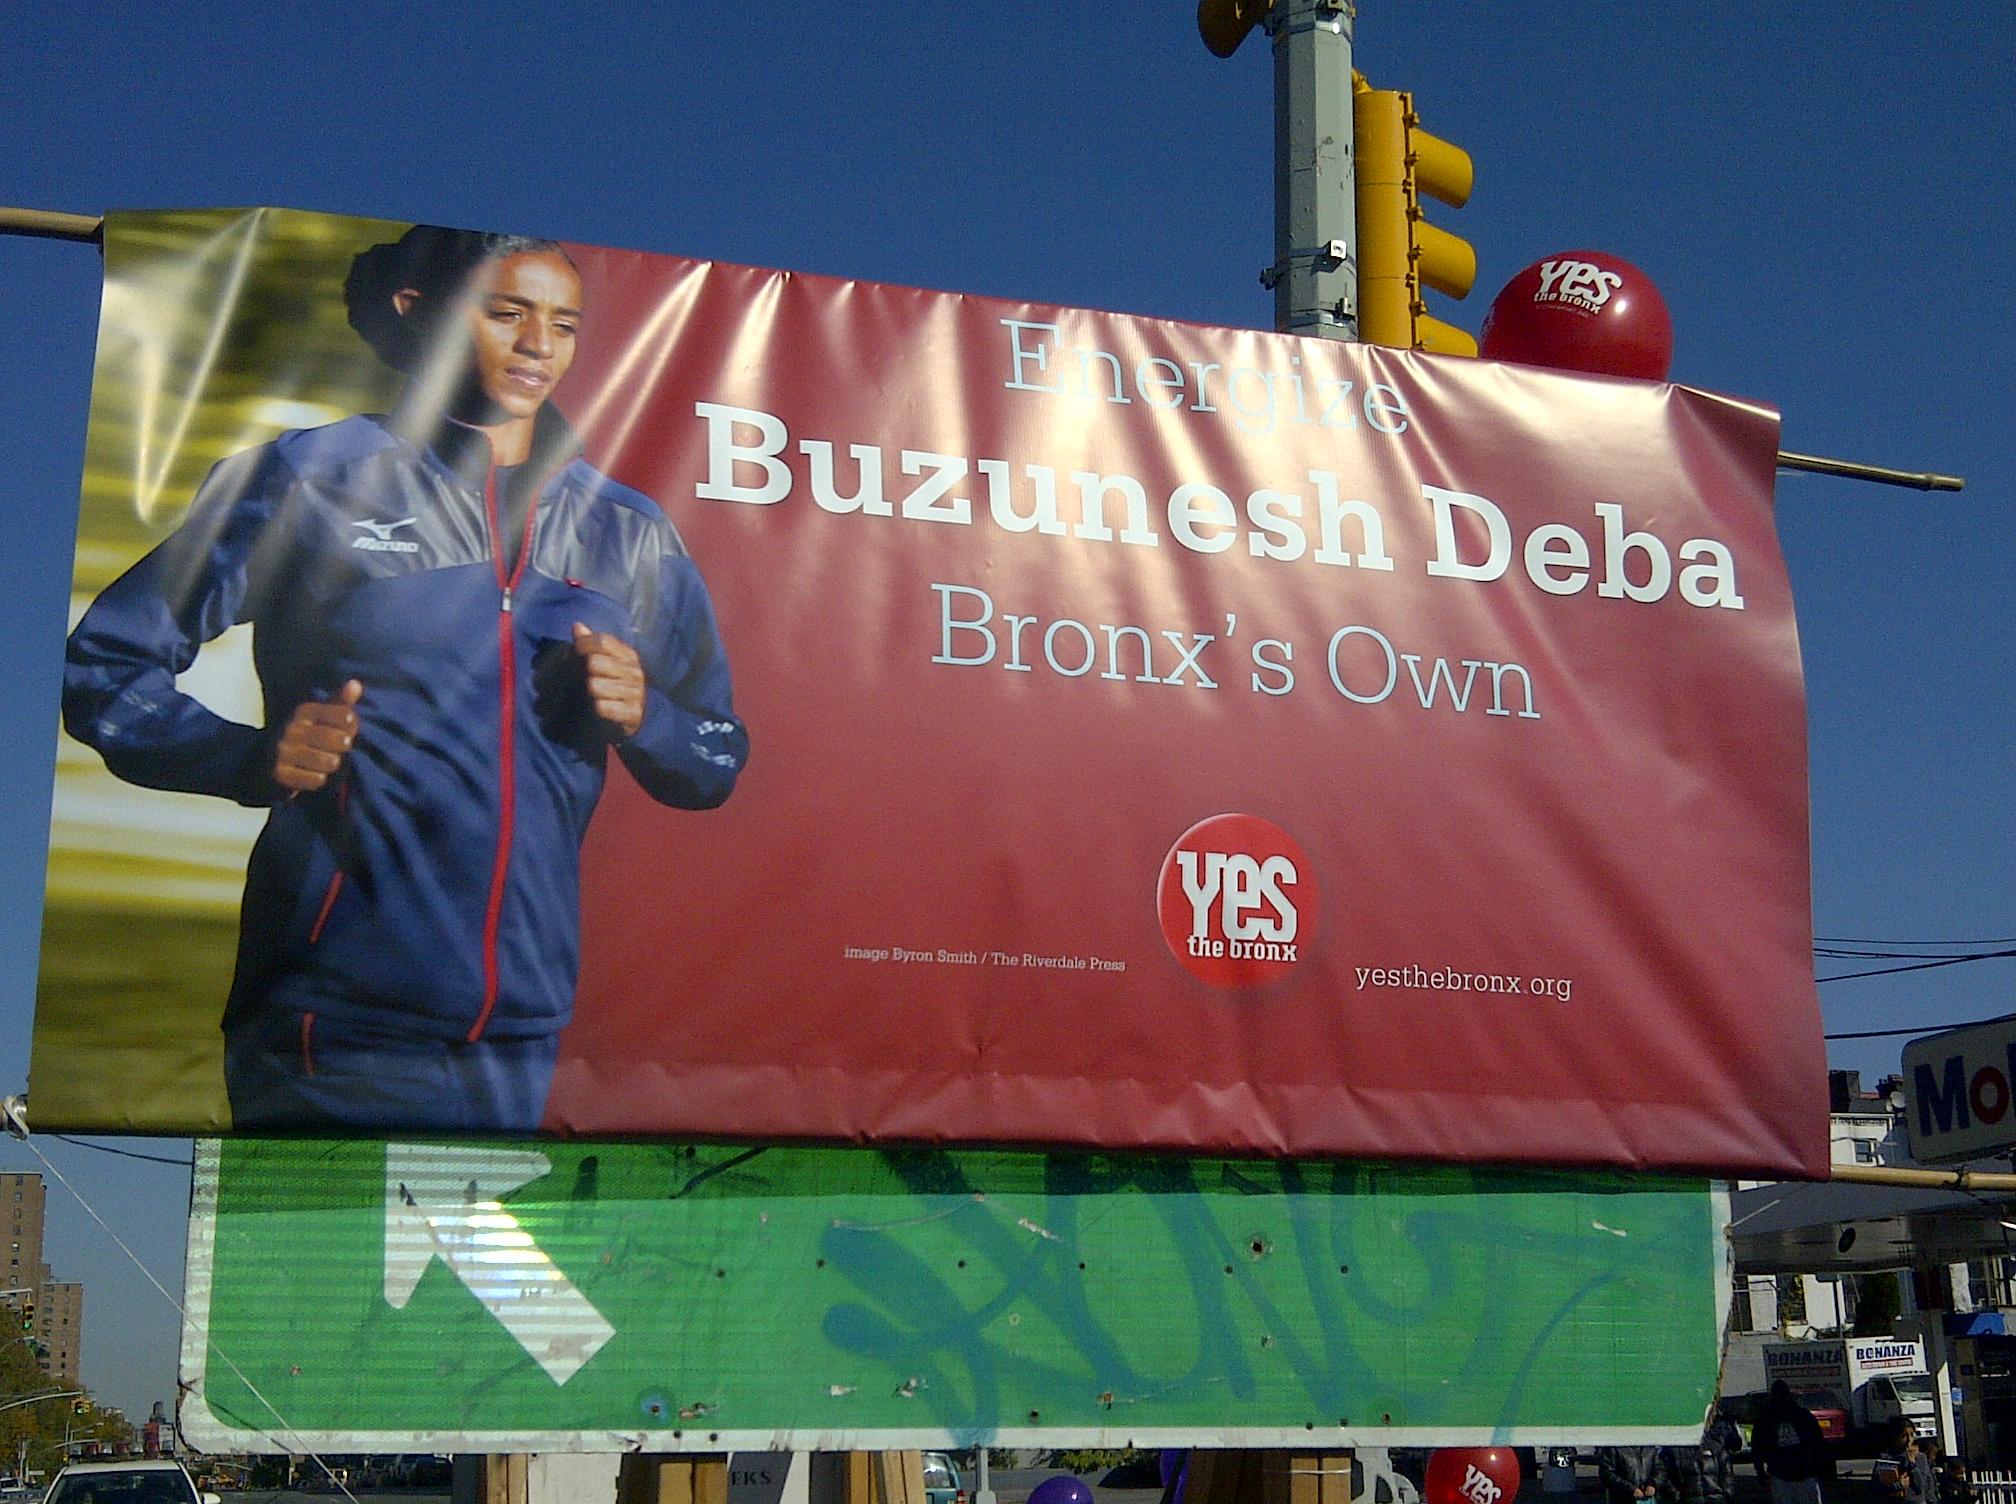 Honoring Ethiopian-born Kingsbridge resident Buzunesh Deba.